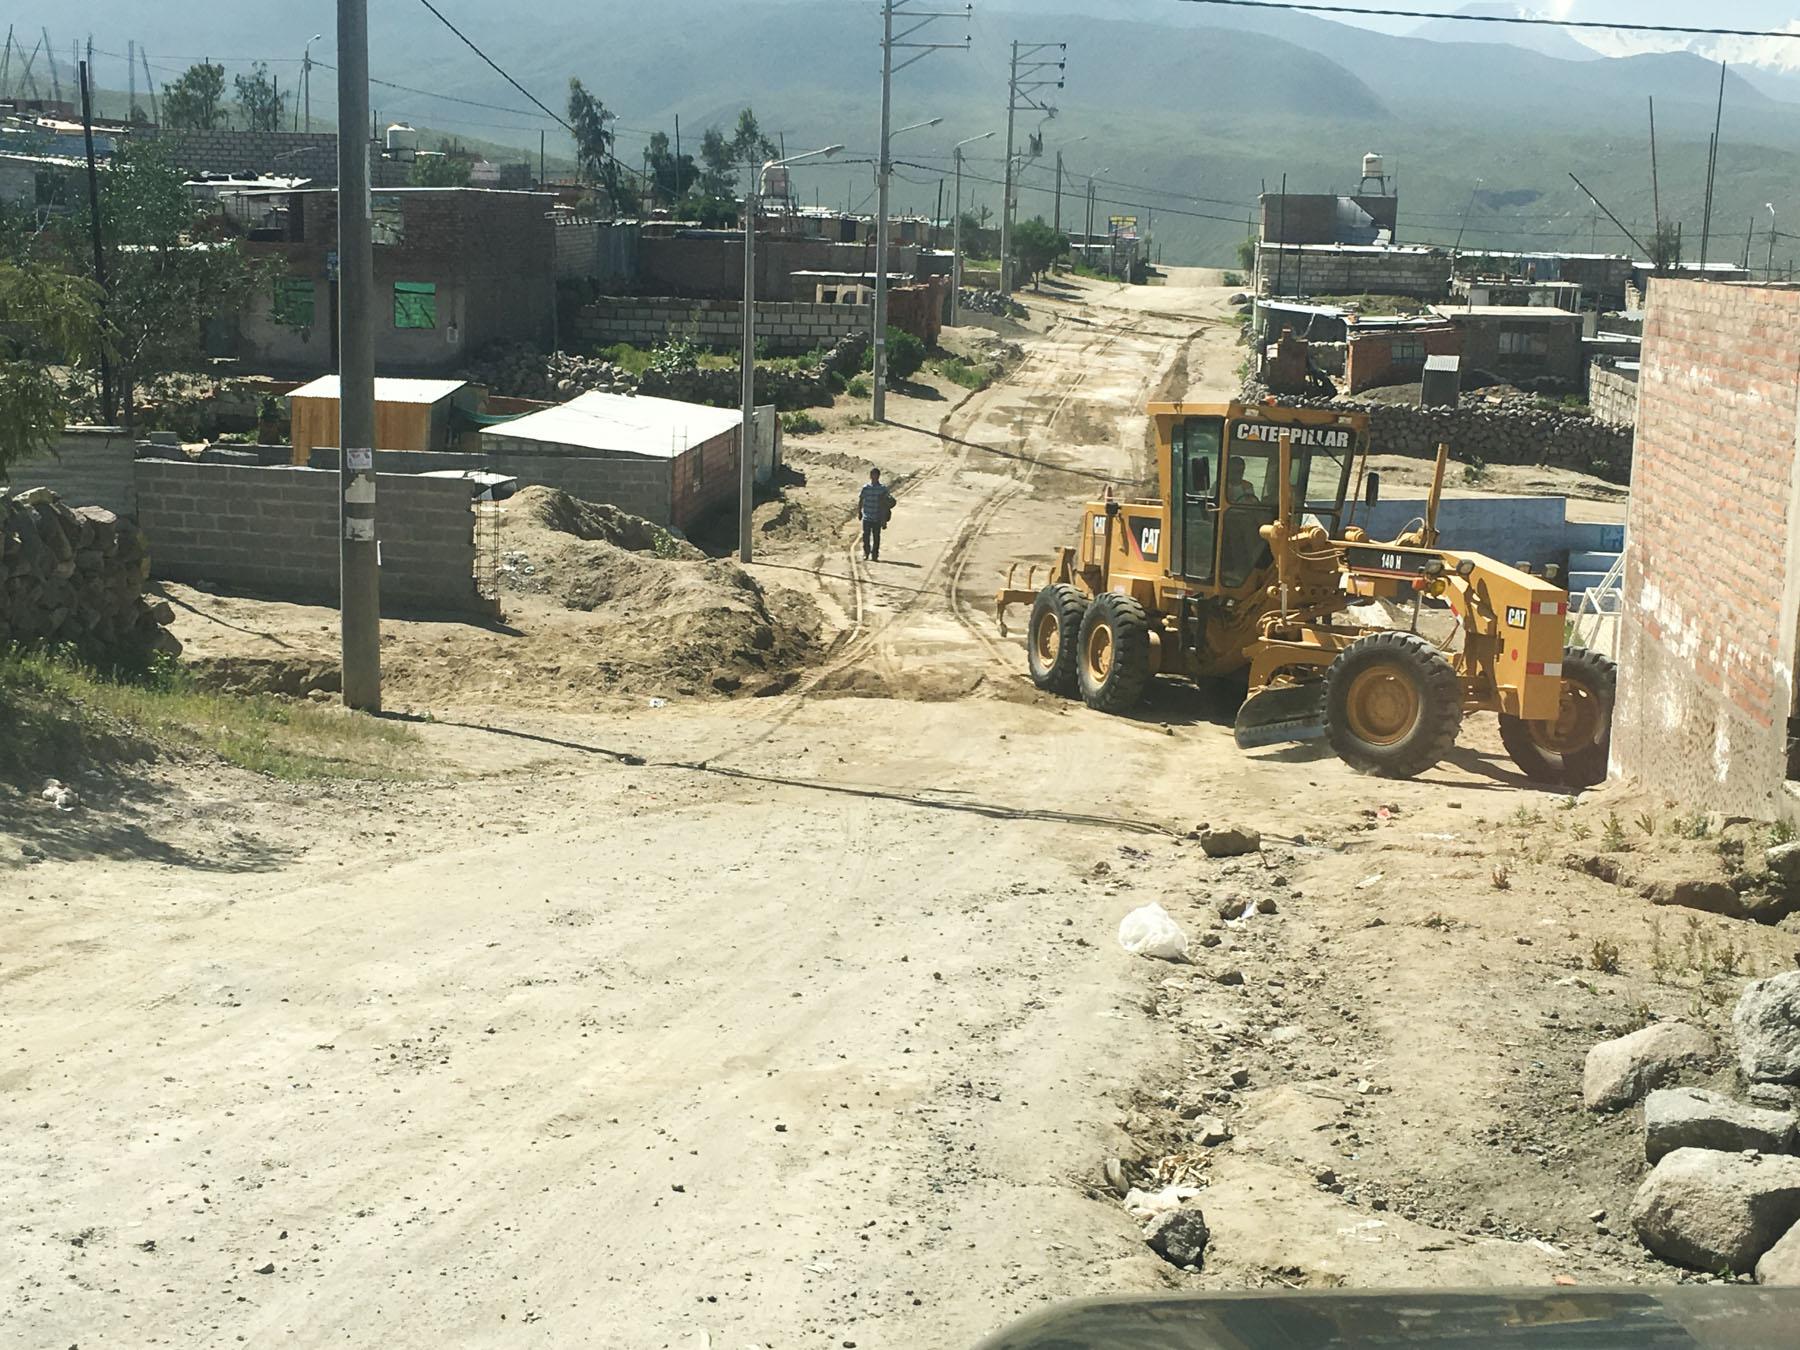 Rebuilding the roads